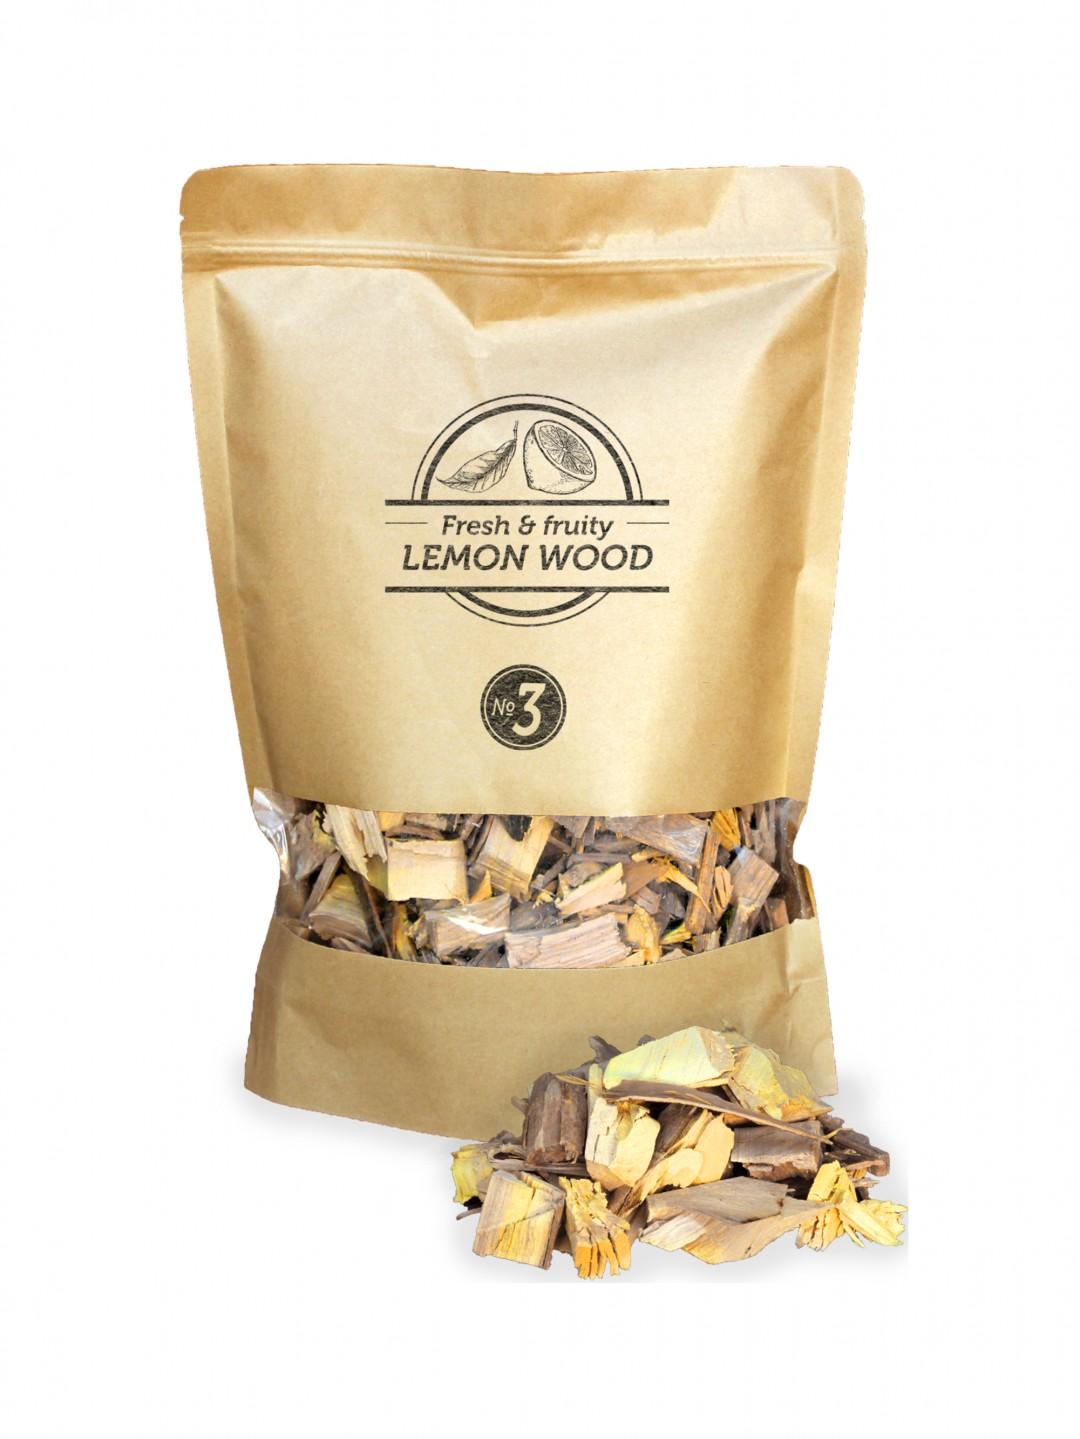 SOW lemon chips